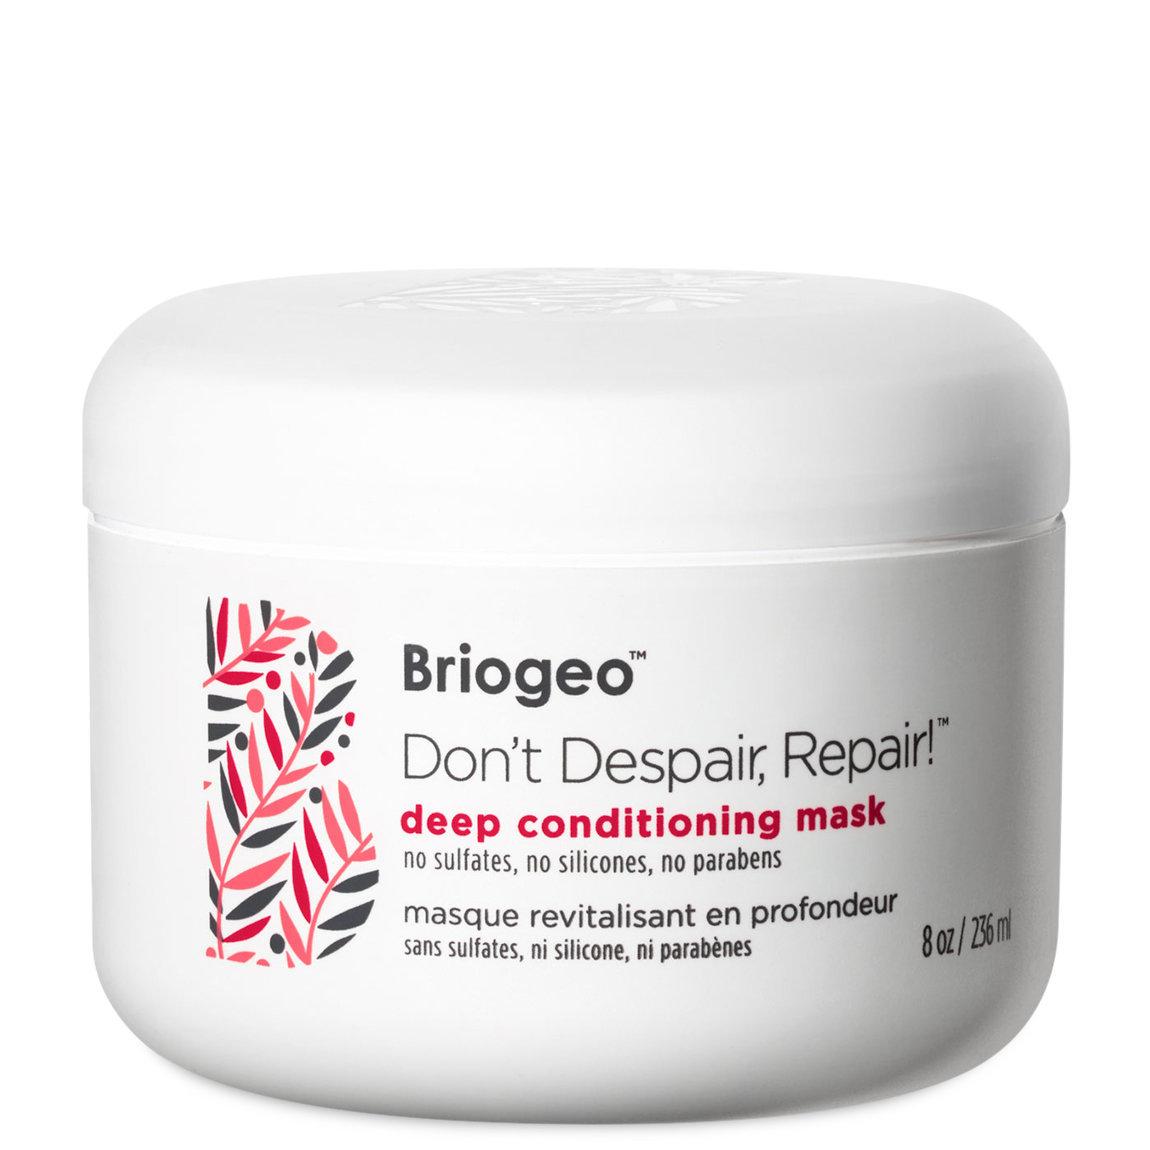 Briogeo Don't Despair, Repair! Deep Conditioning Mask 8 oz product swatch.